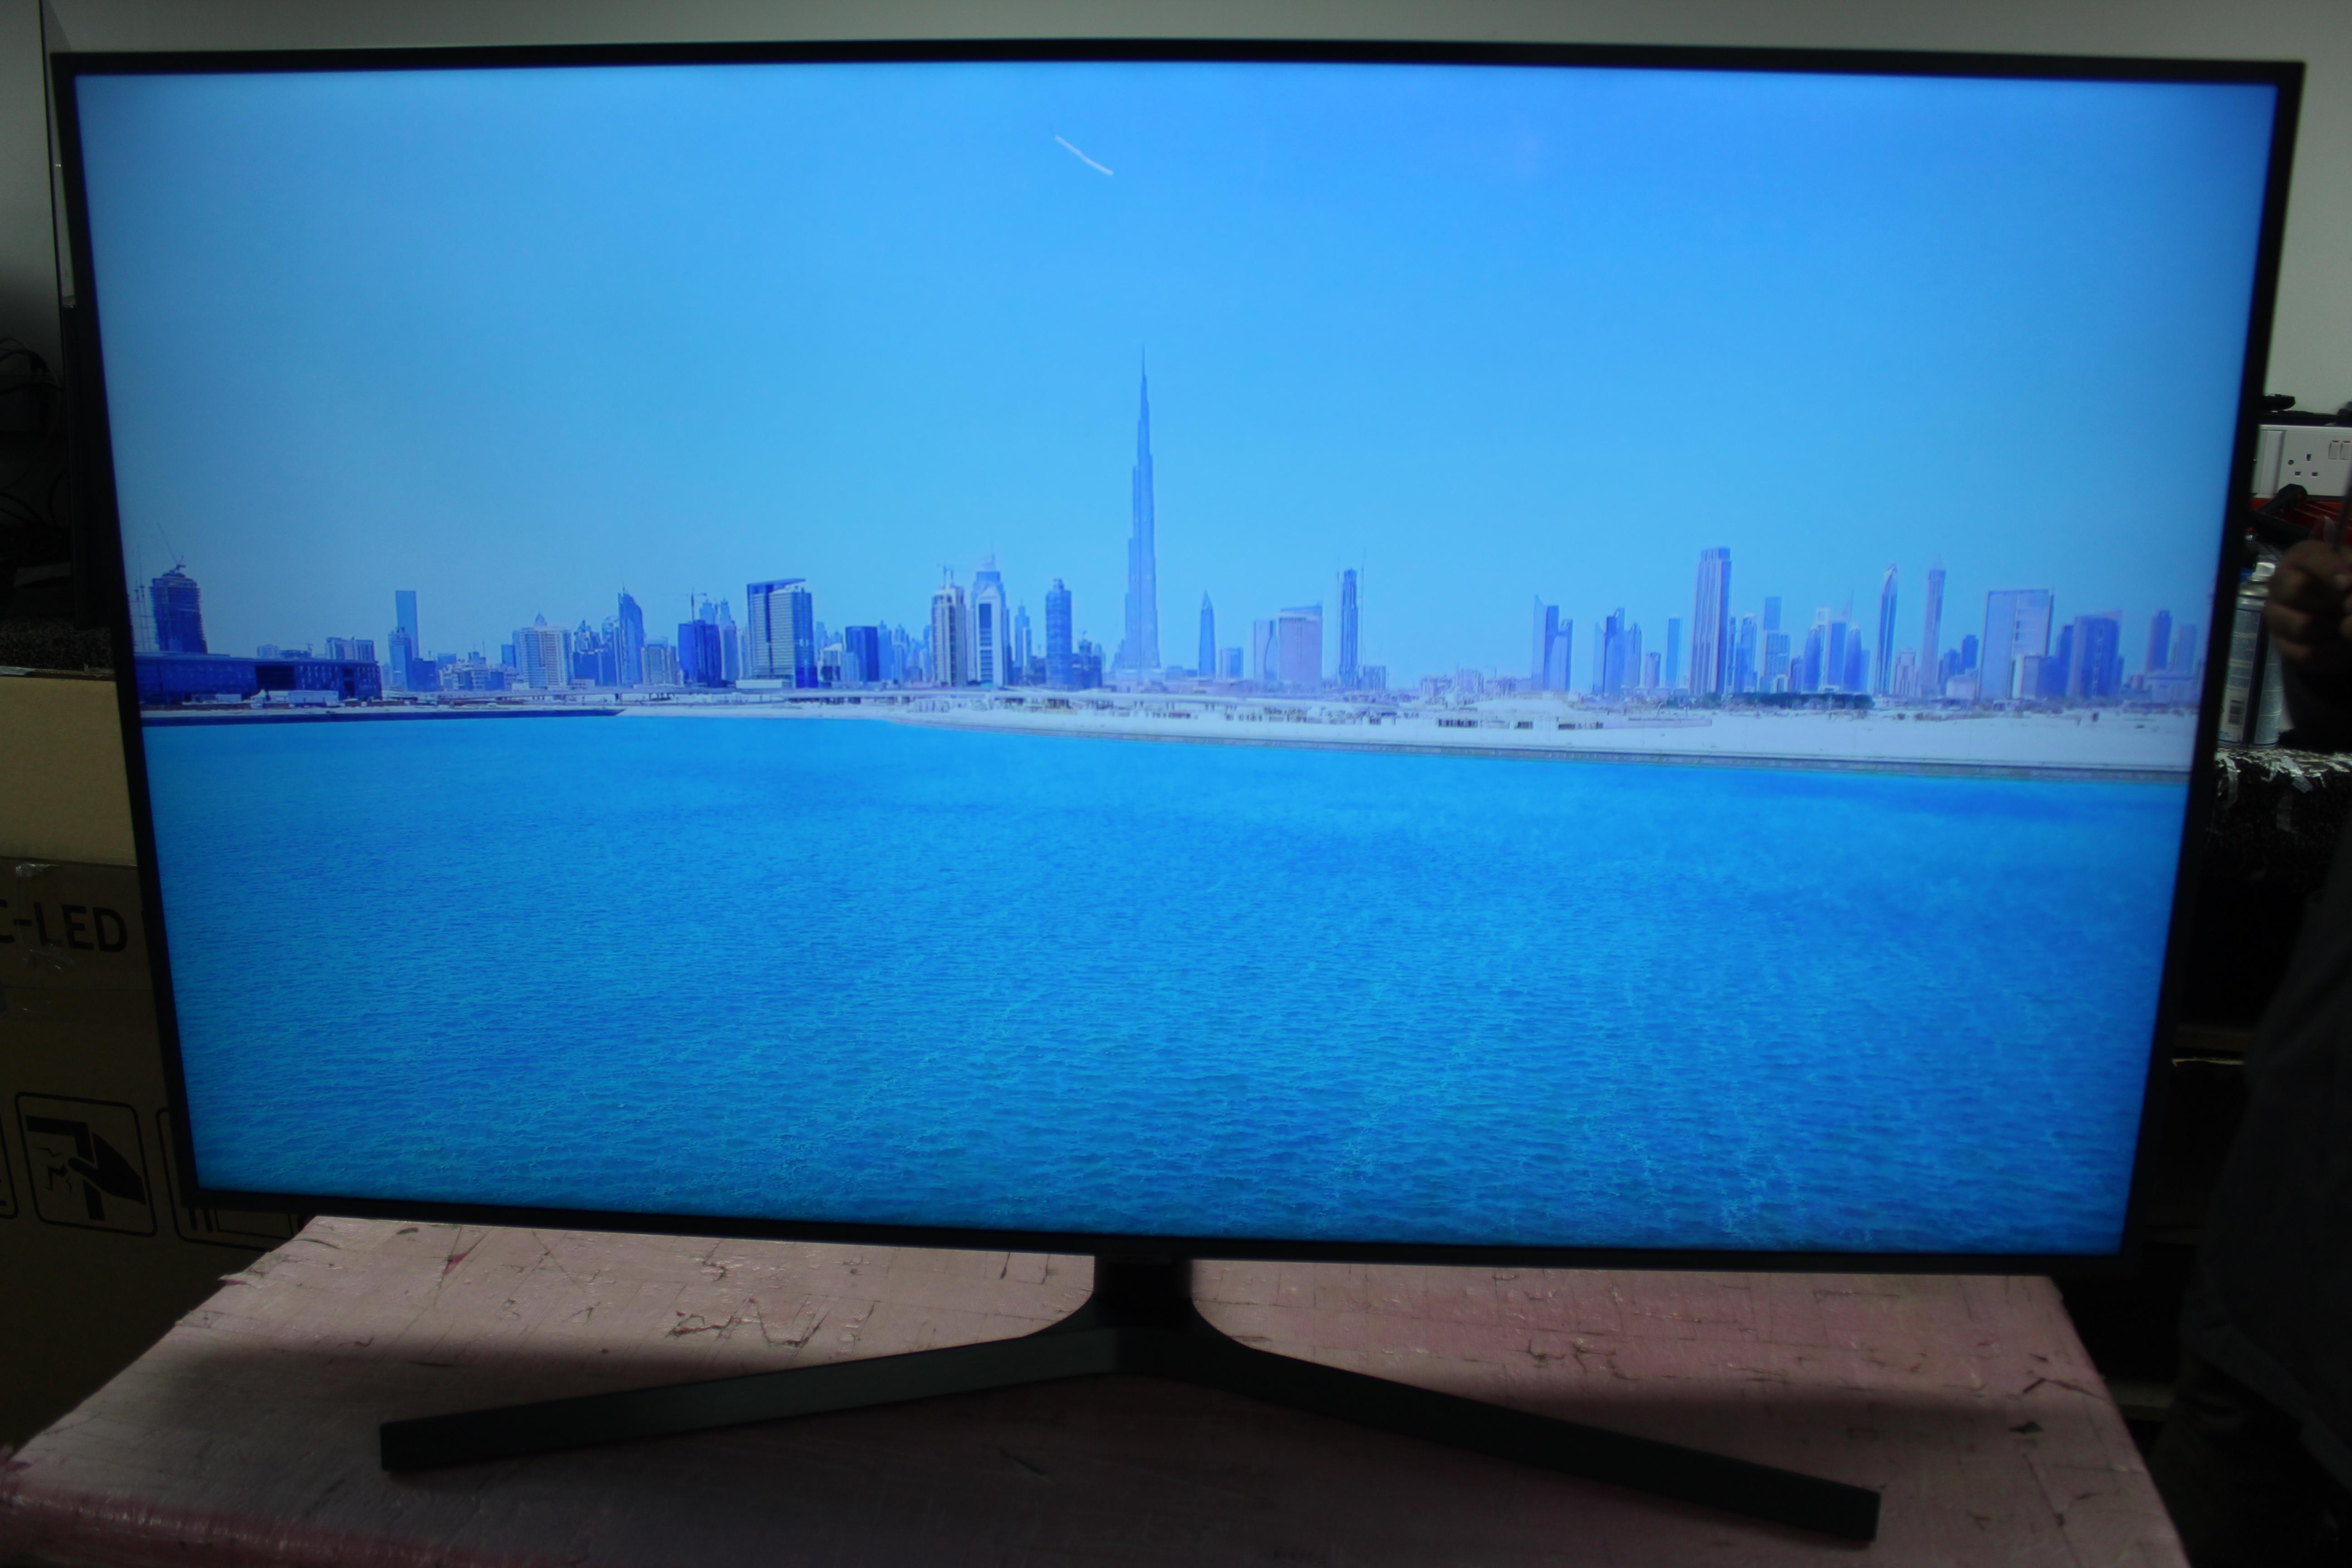 "55"" Samsung UE55RU7400 4K Certified Ultra HD HDR Smart LED TV"